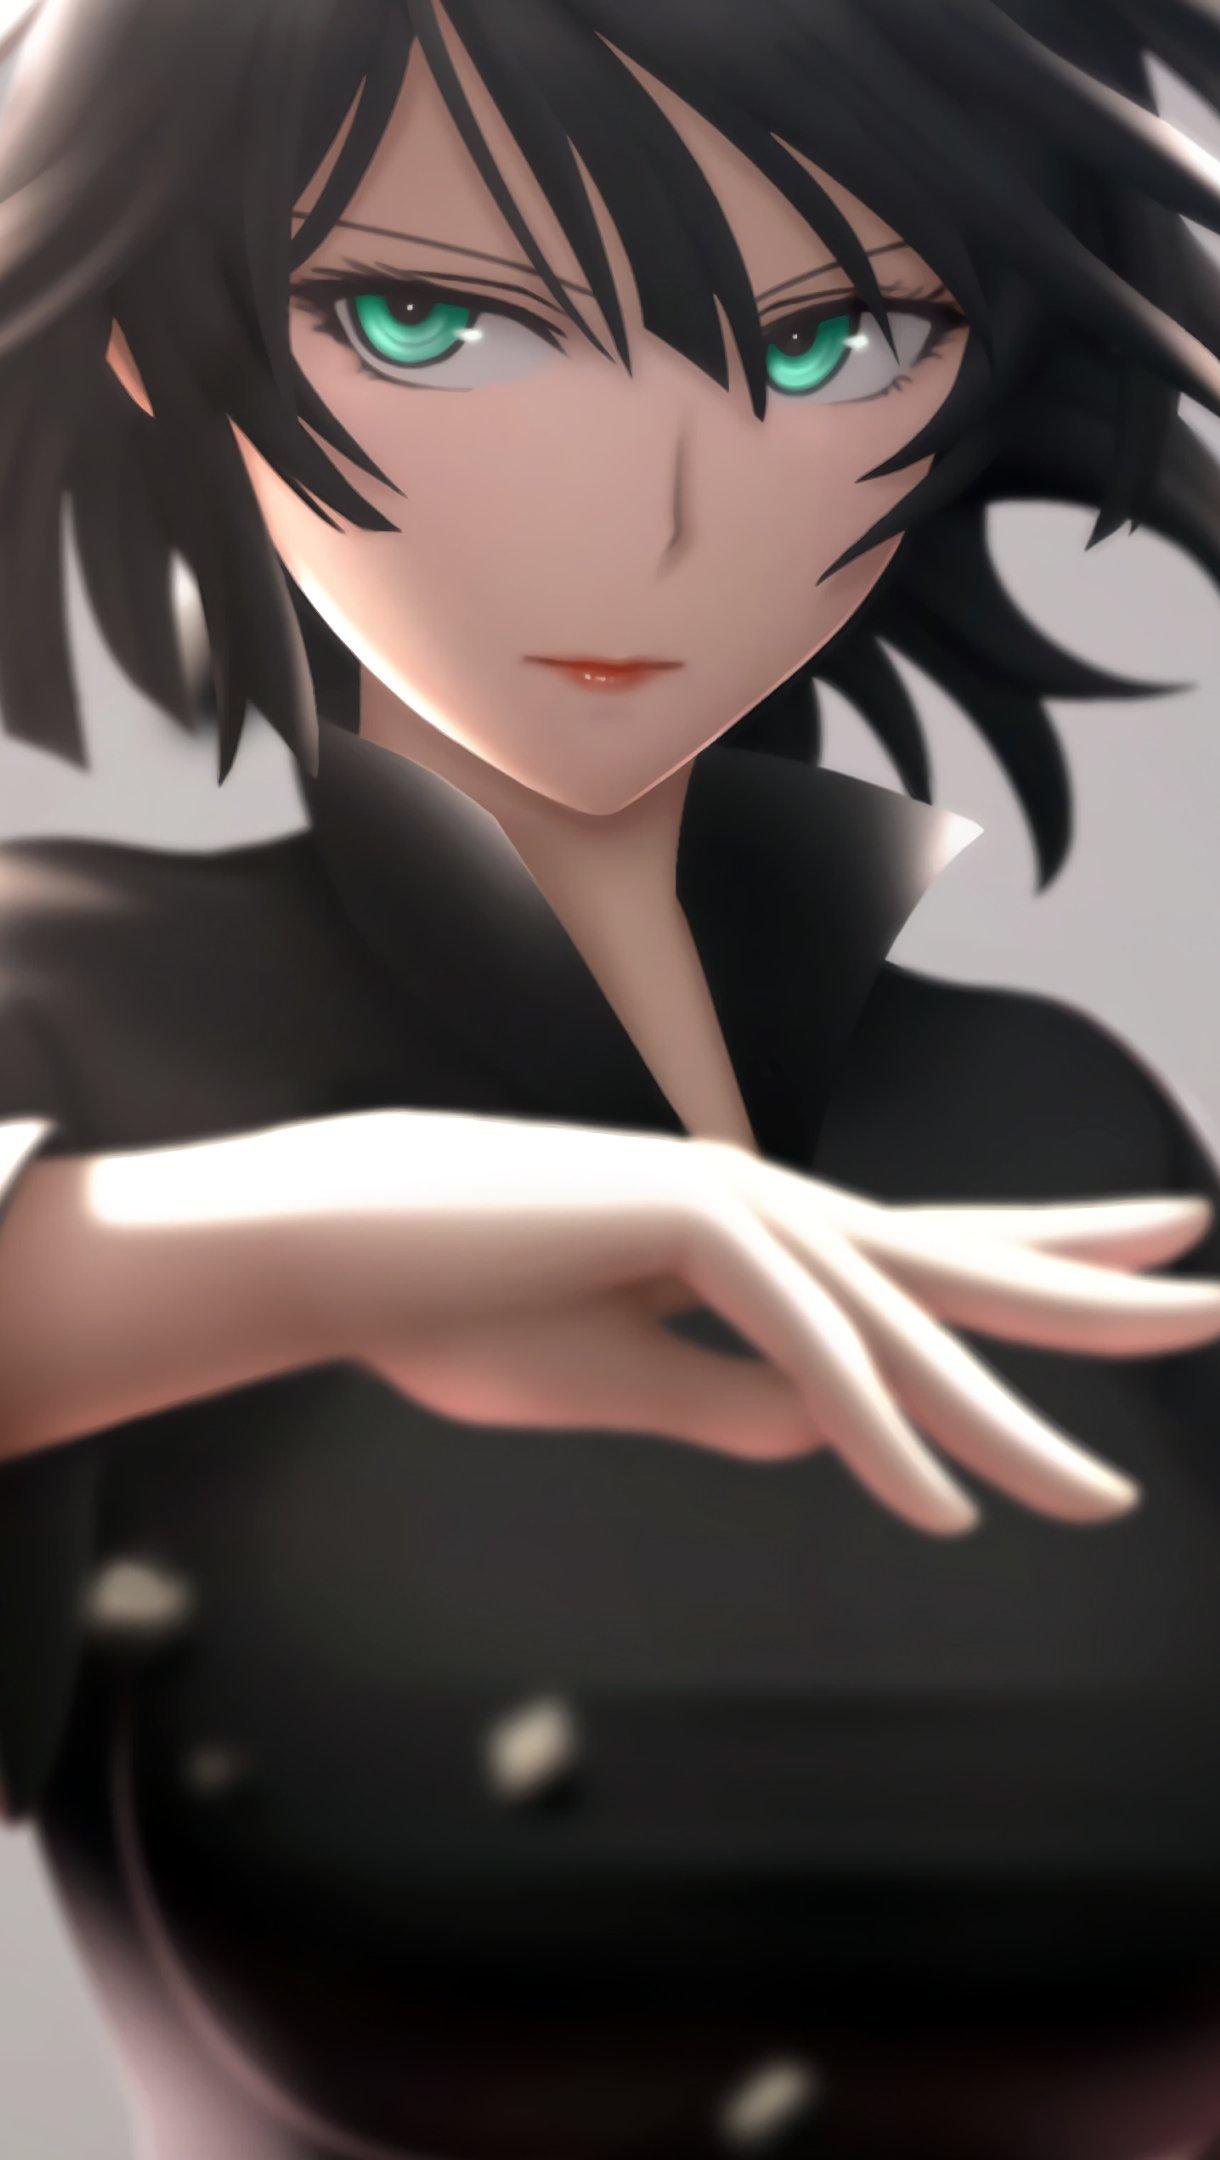 Anime Wallpaper Fubuki One Punch Man Vertical